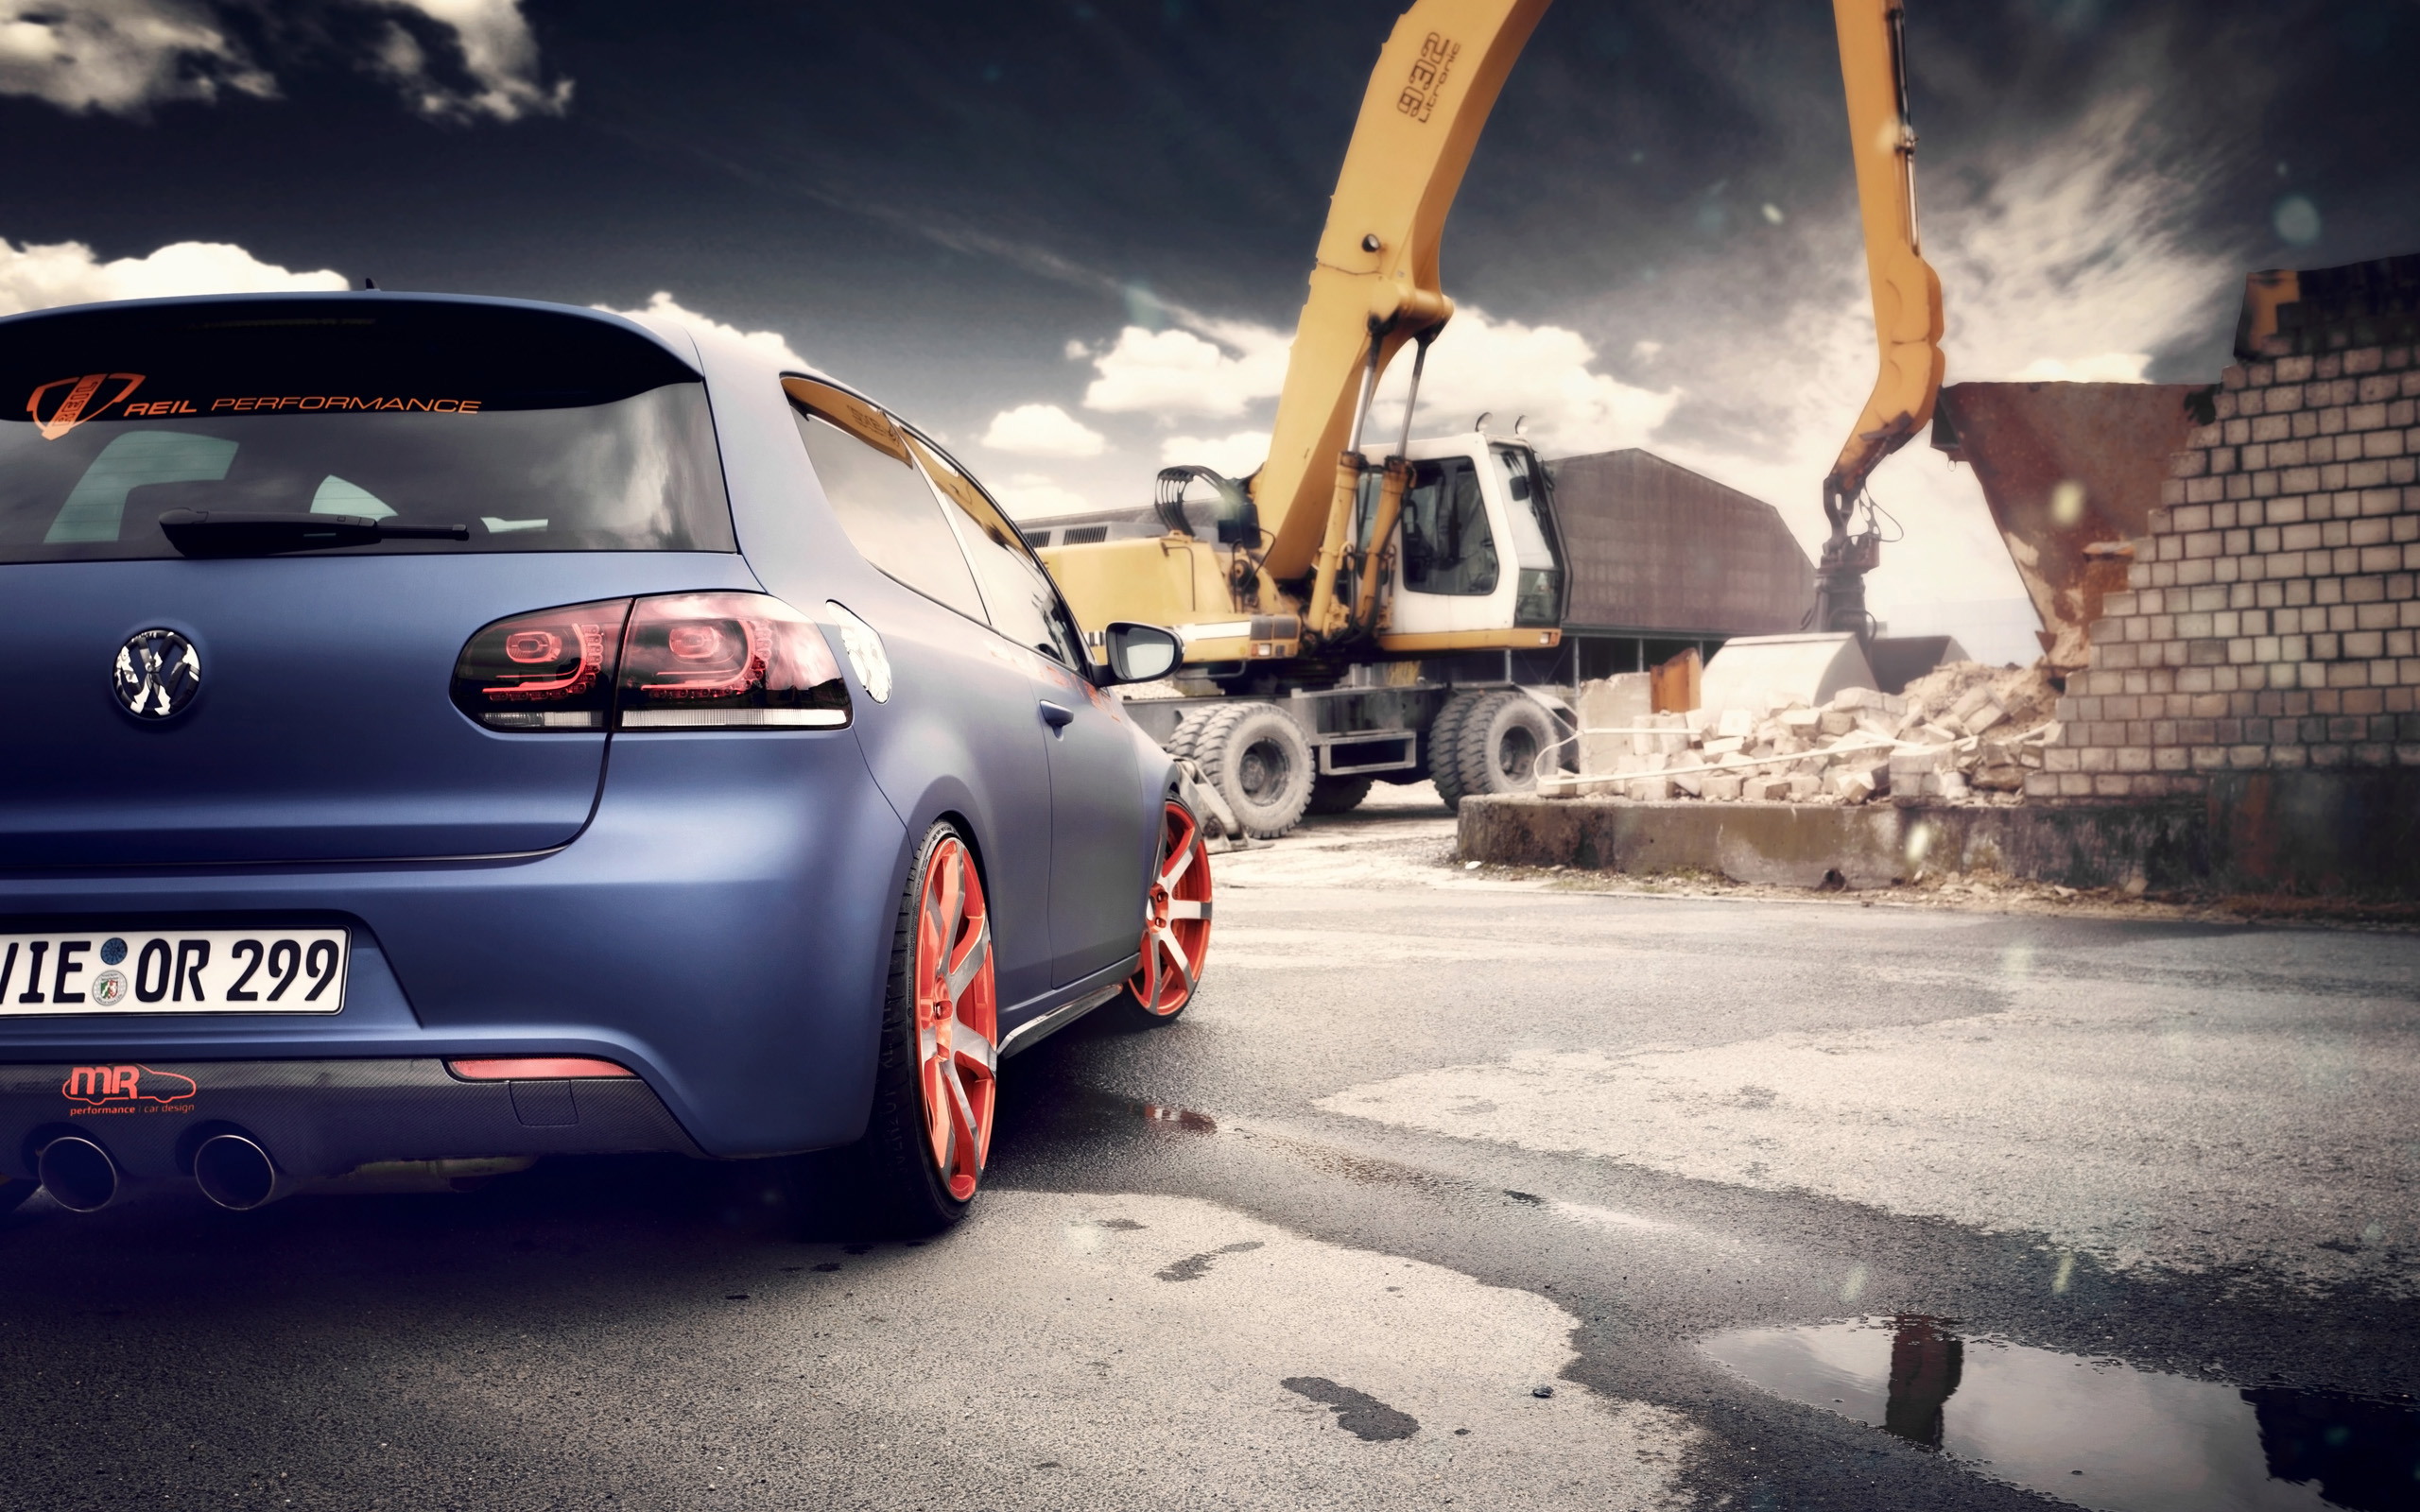 2012 Bbm Volkswagen Golf 2 Wallpaper Hd Car Wallpapers Id 3670